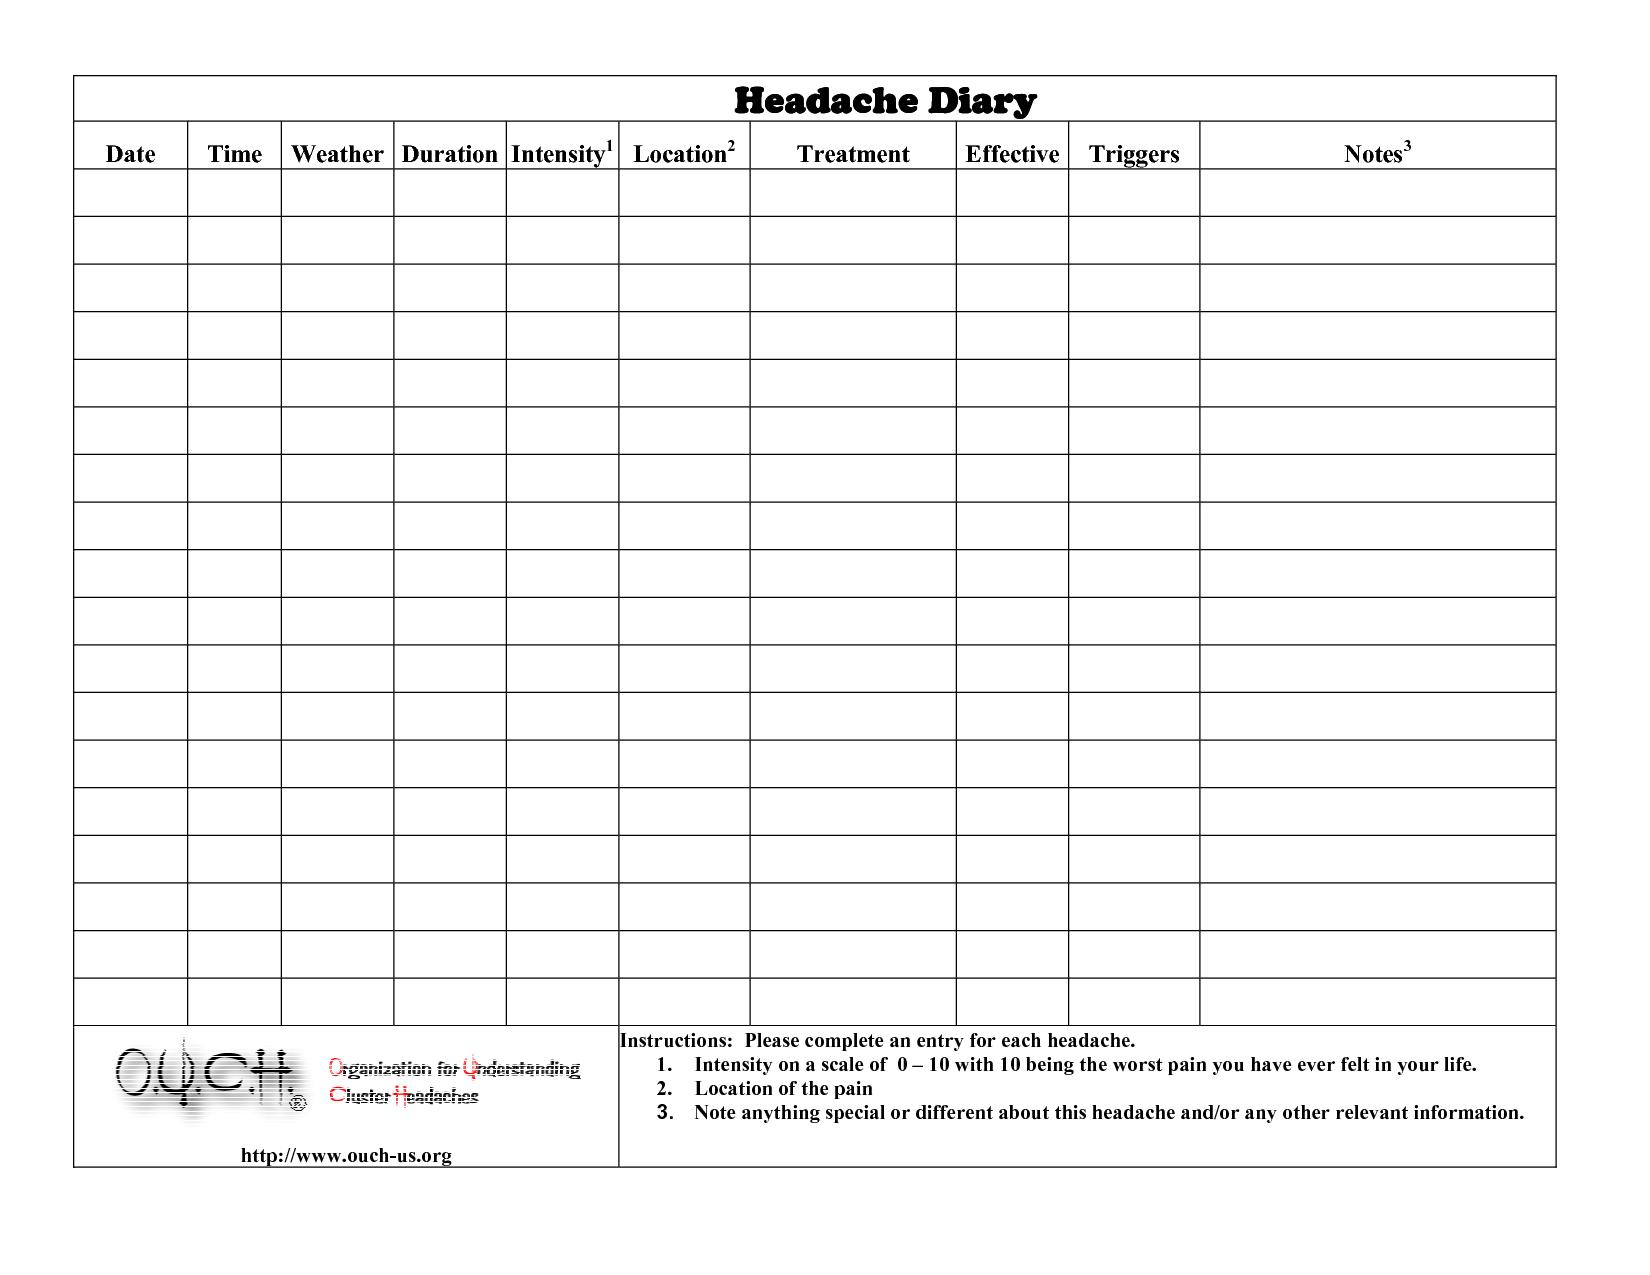 Headache Diary Headache Diary | Health | Headache Diary - Free Printable Headache Diary